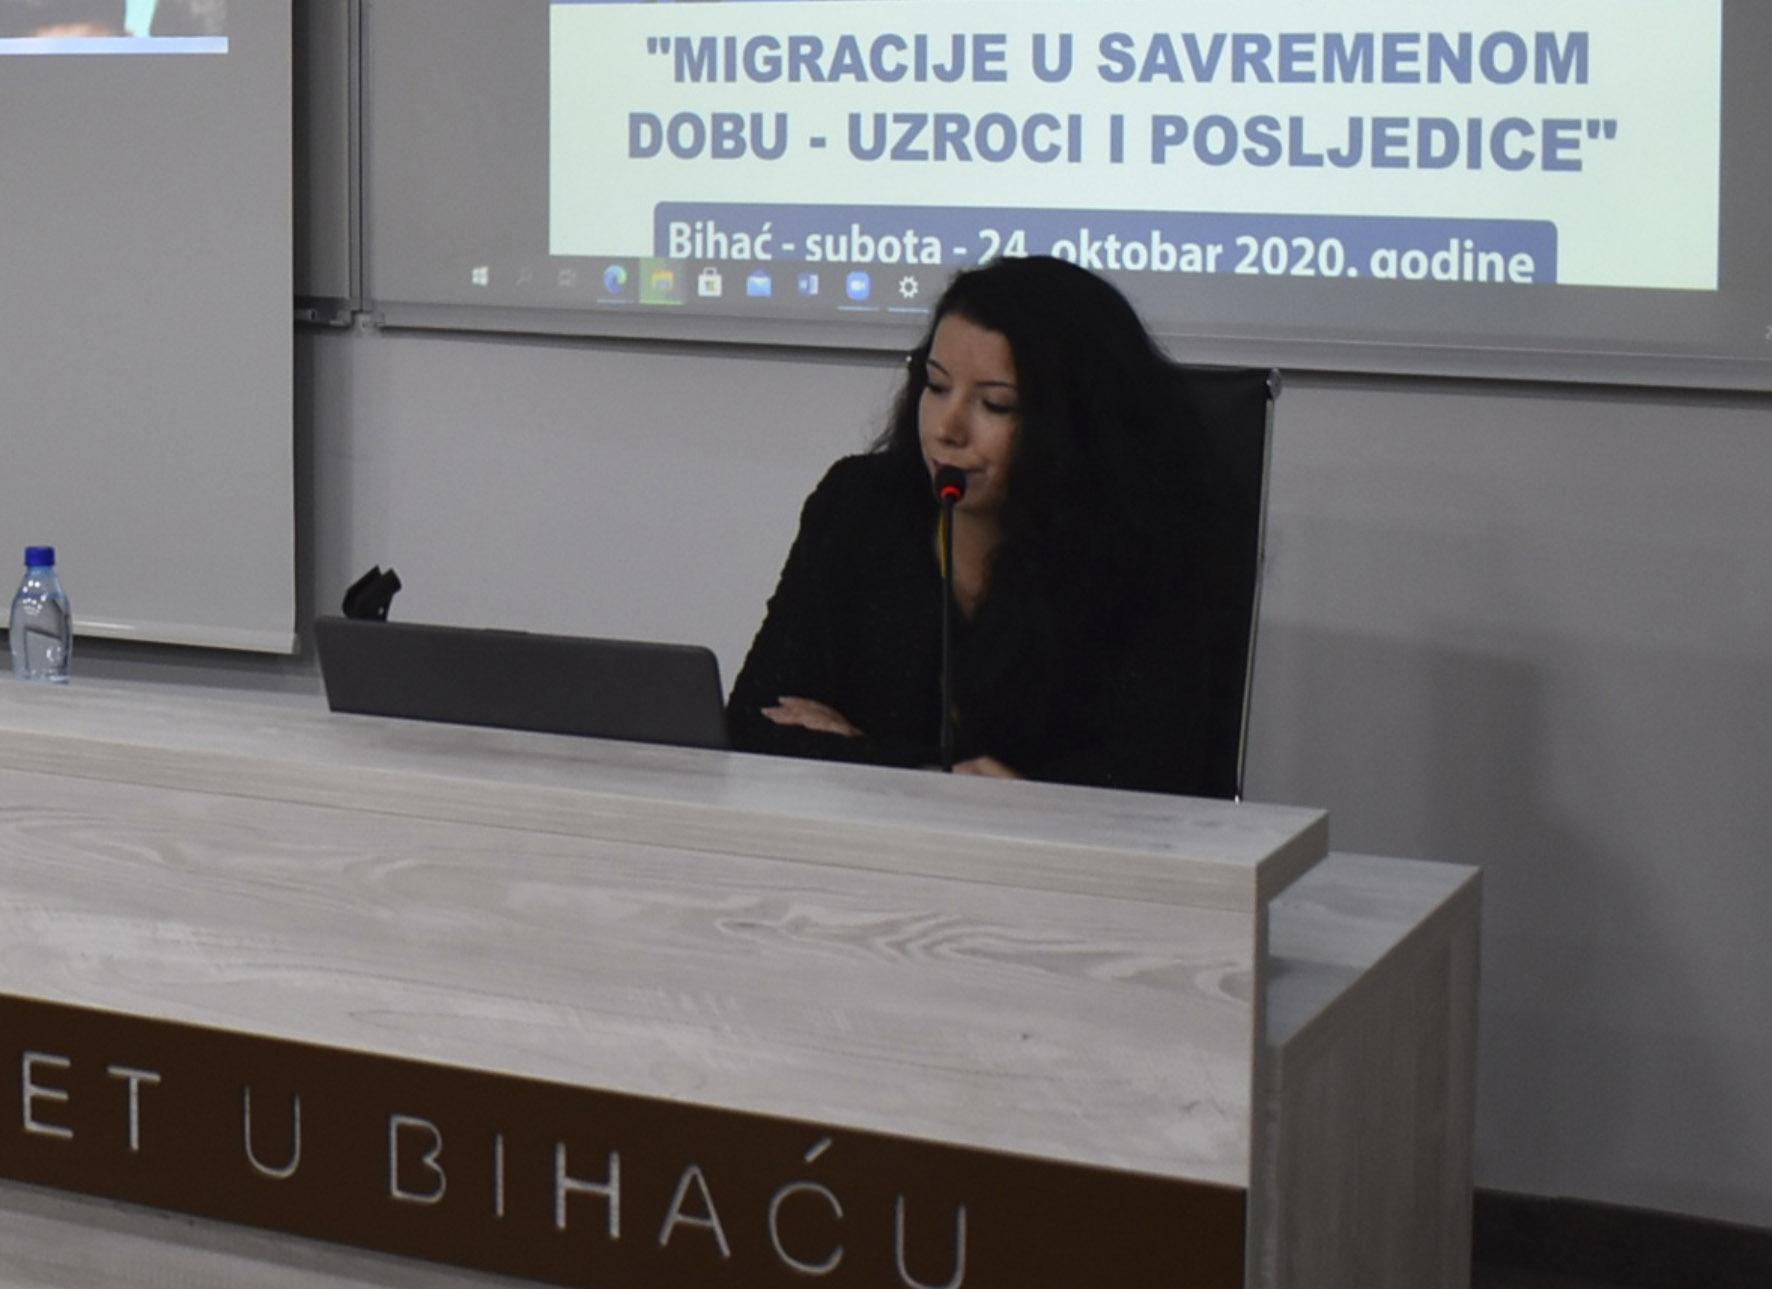 Dr. sc. Dijana Sulejmanović u Journal of Cross-Cultural Psychology